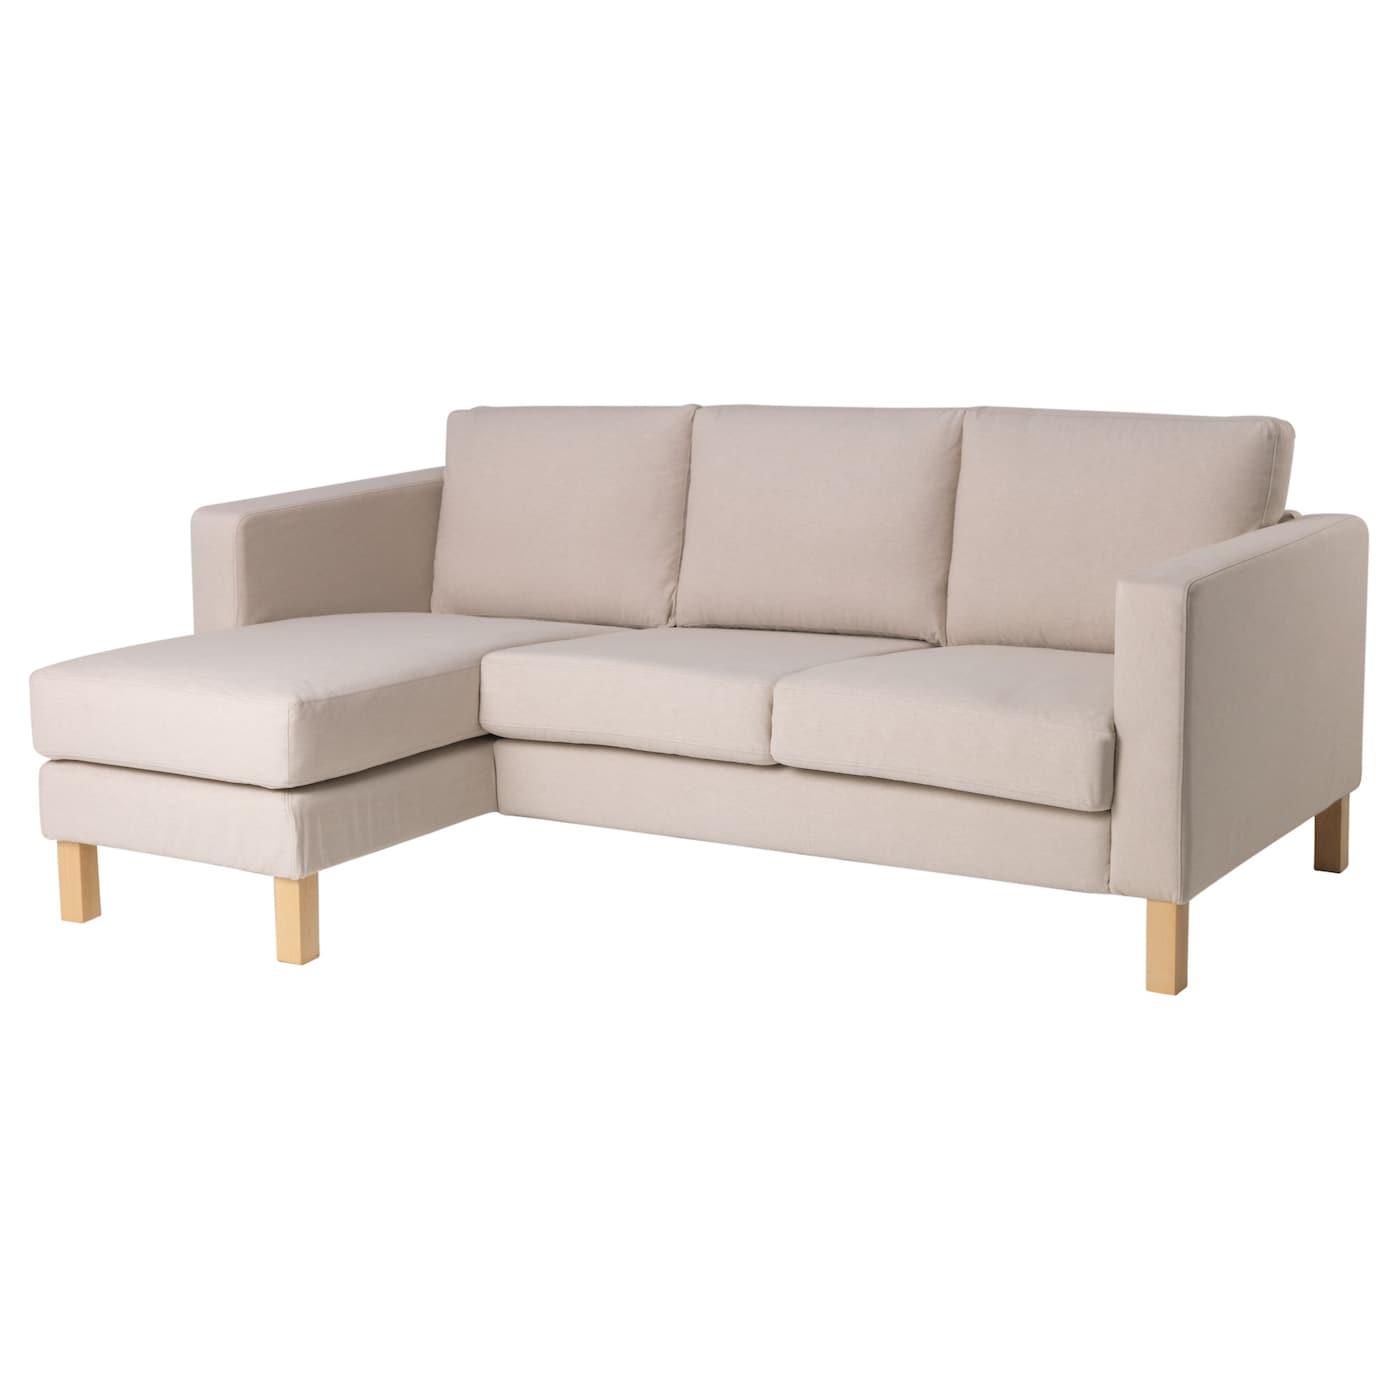 Karlstad Compact 2 Seat Sofa W Chaise Lounge Lofallet Beige Ikea